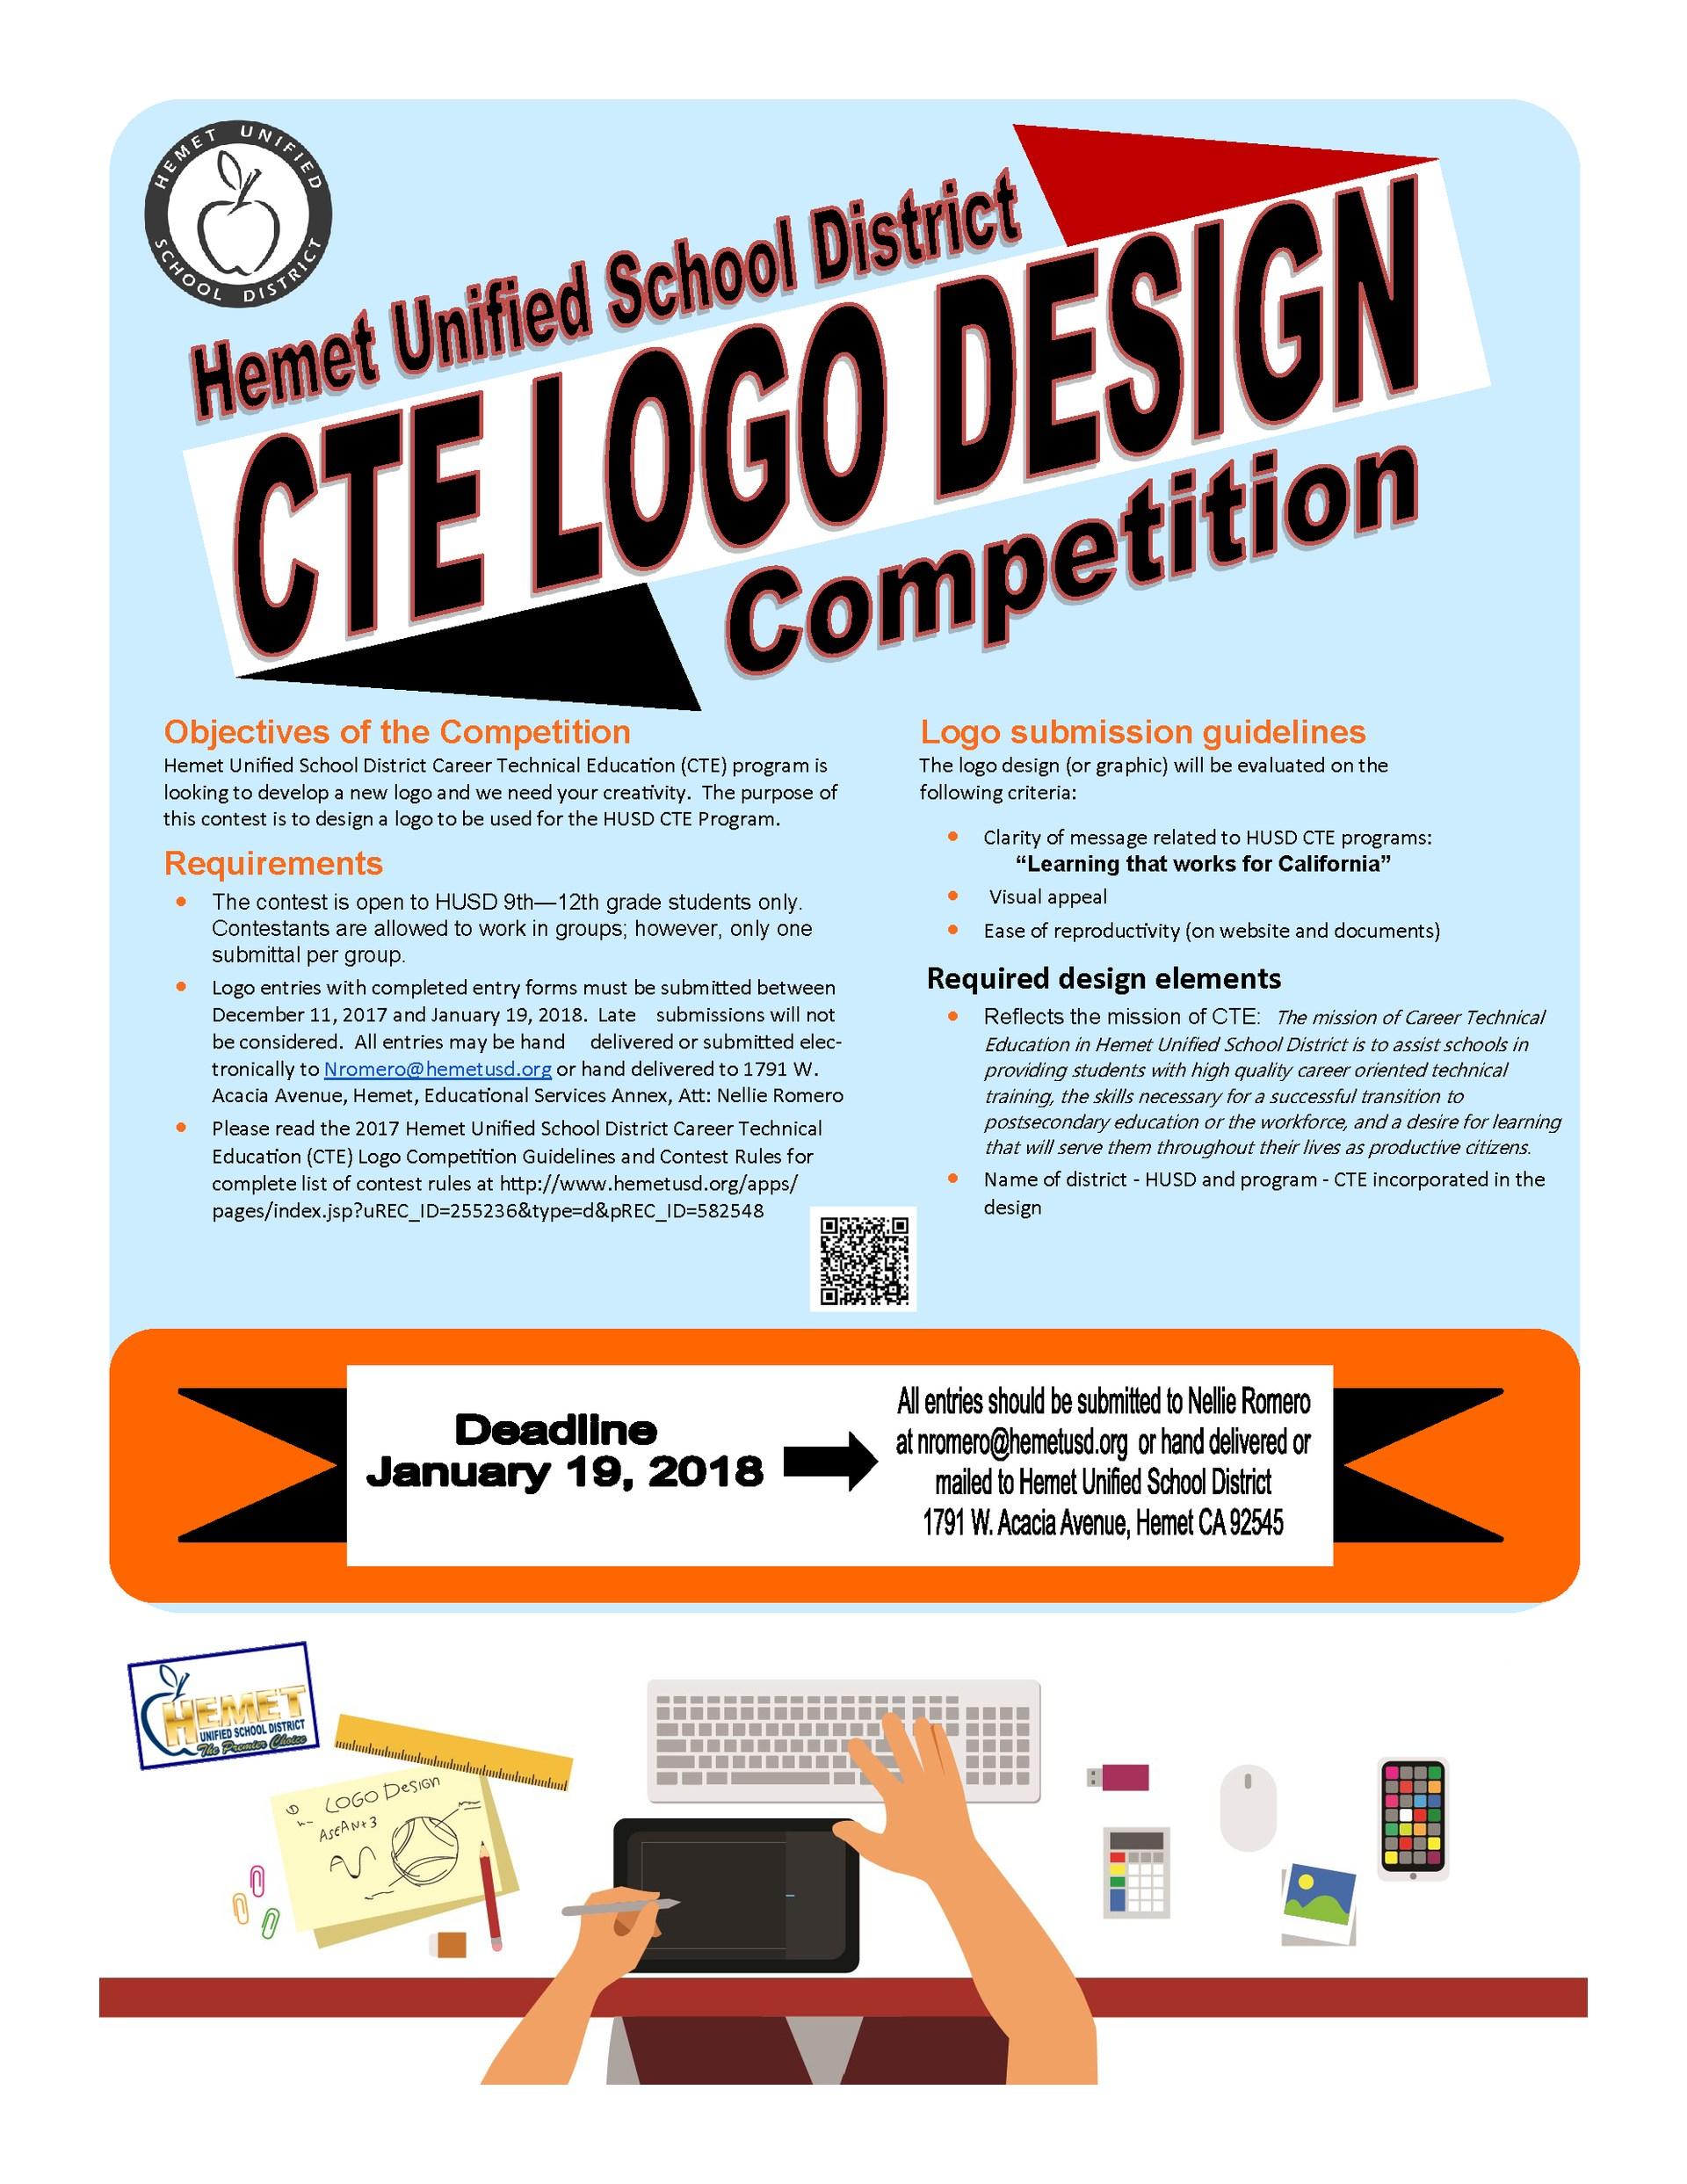 HUSD CTE Logo Design Competition flyer